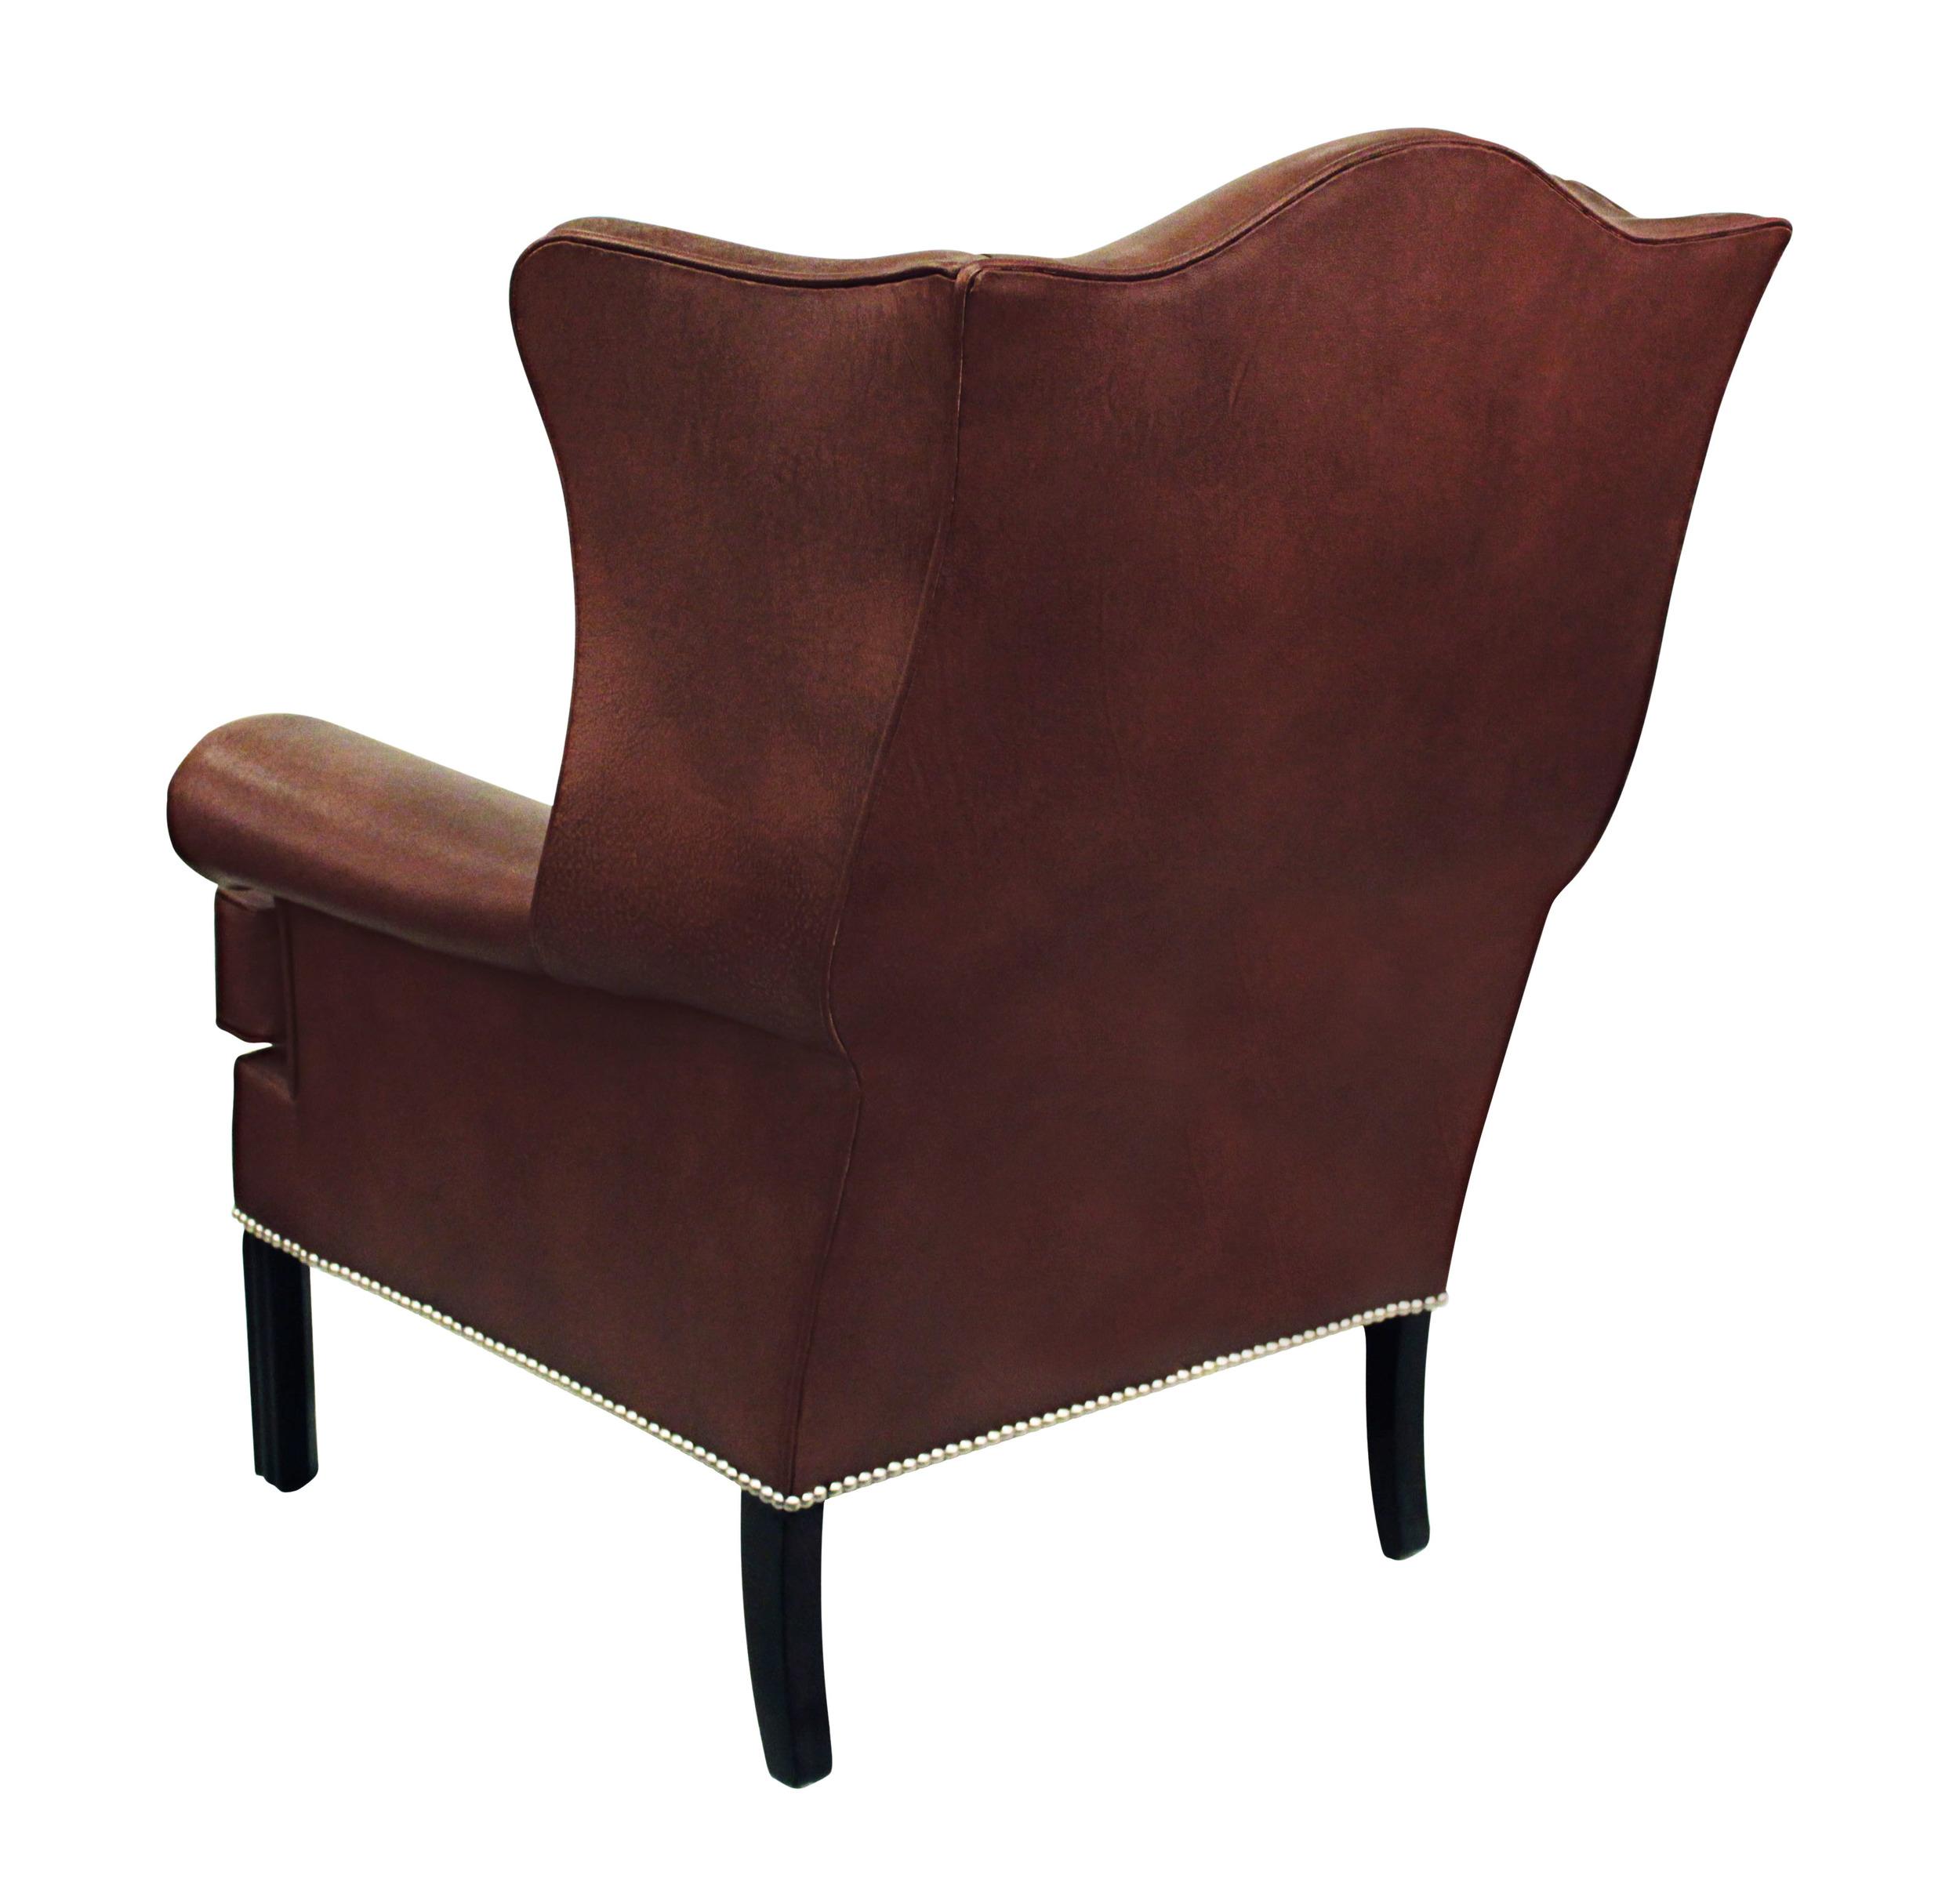 Dunbar 65 late30's wingchair clubchair32 back hires.jpg